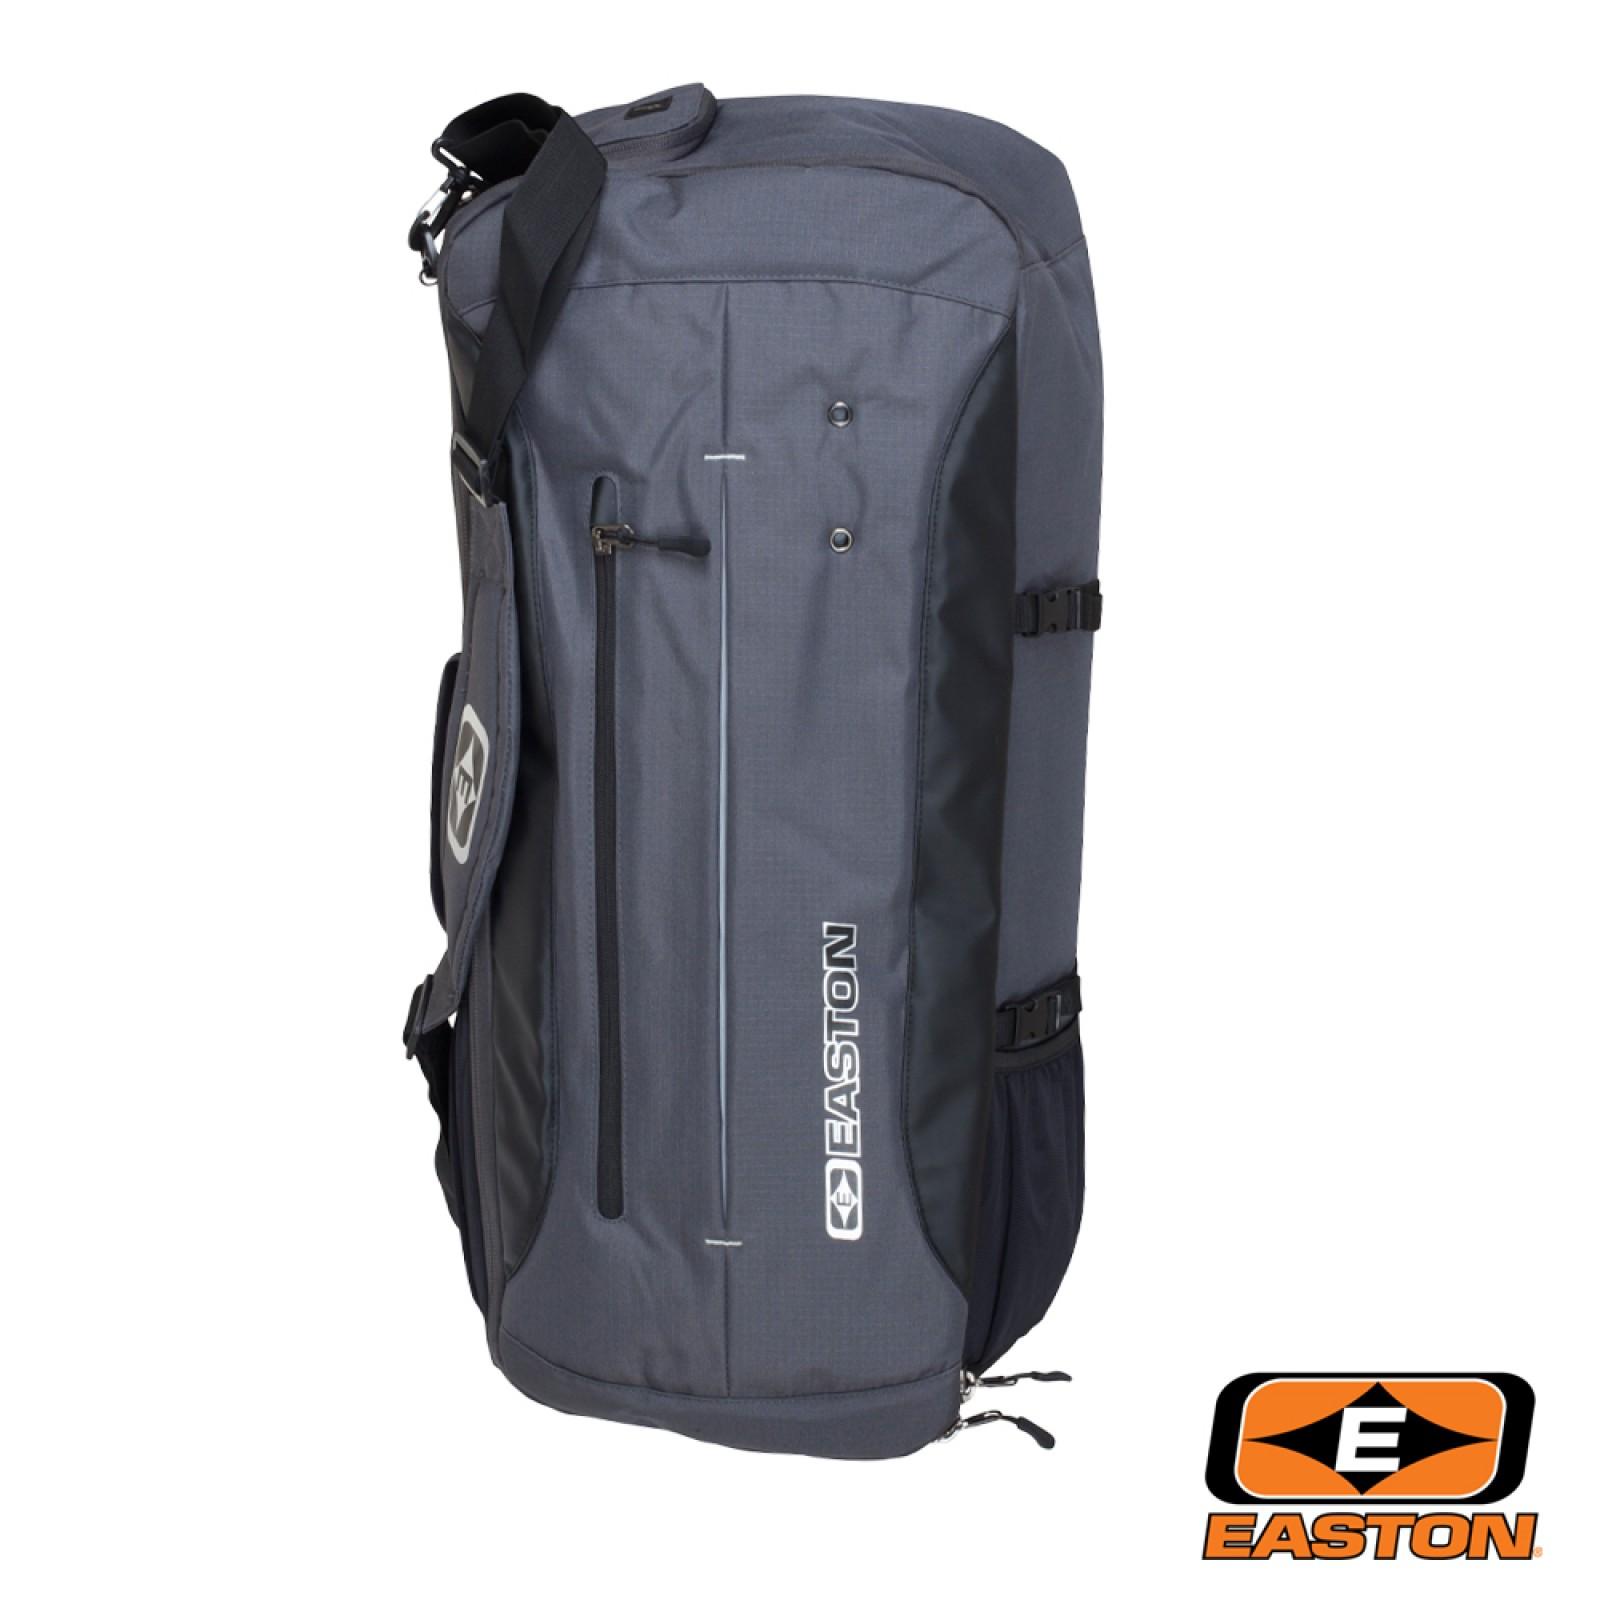 Batoh EASTON Deluxe Recurve Pack